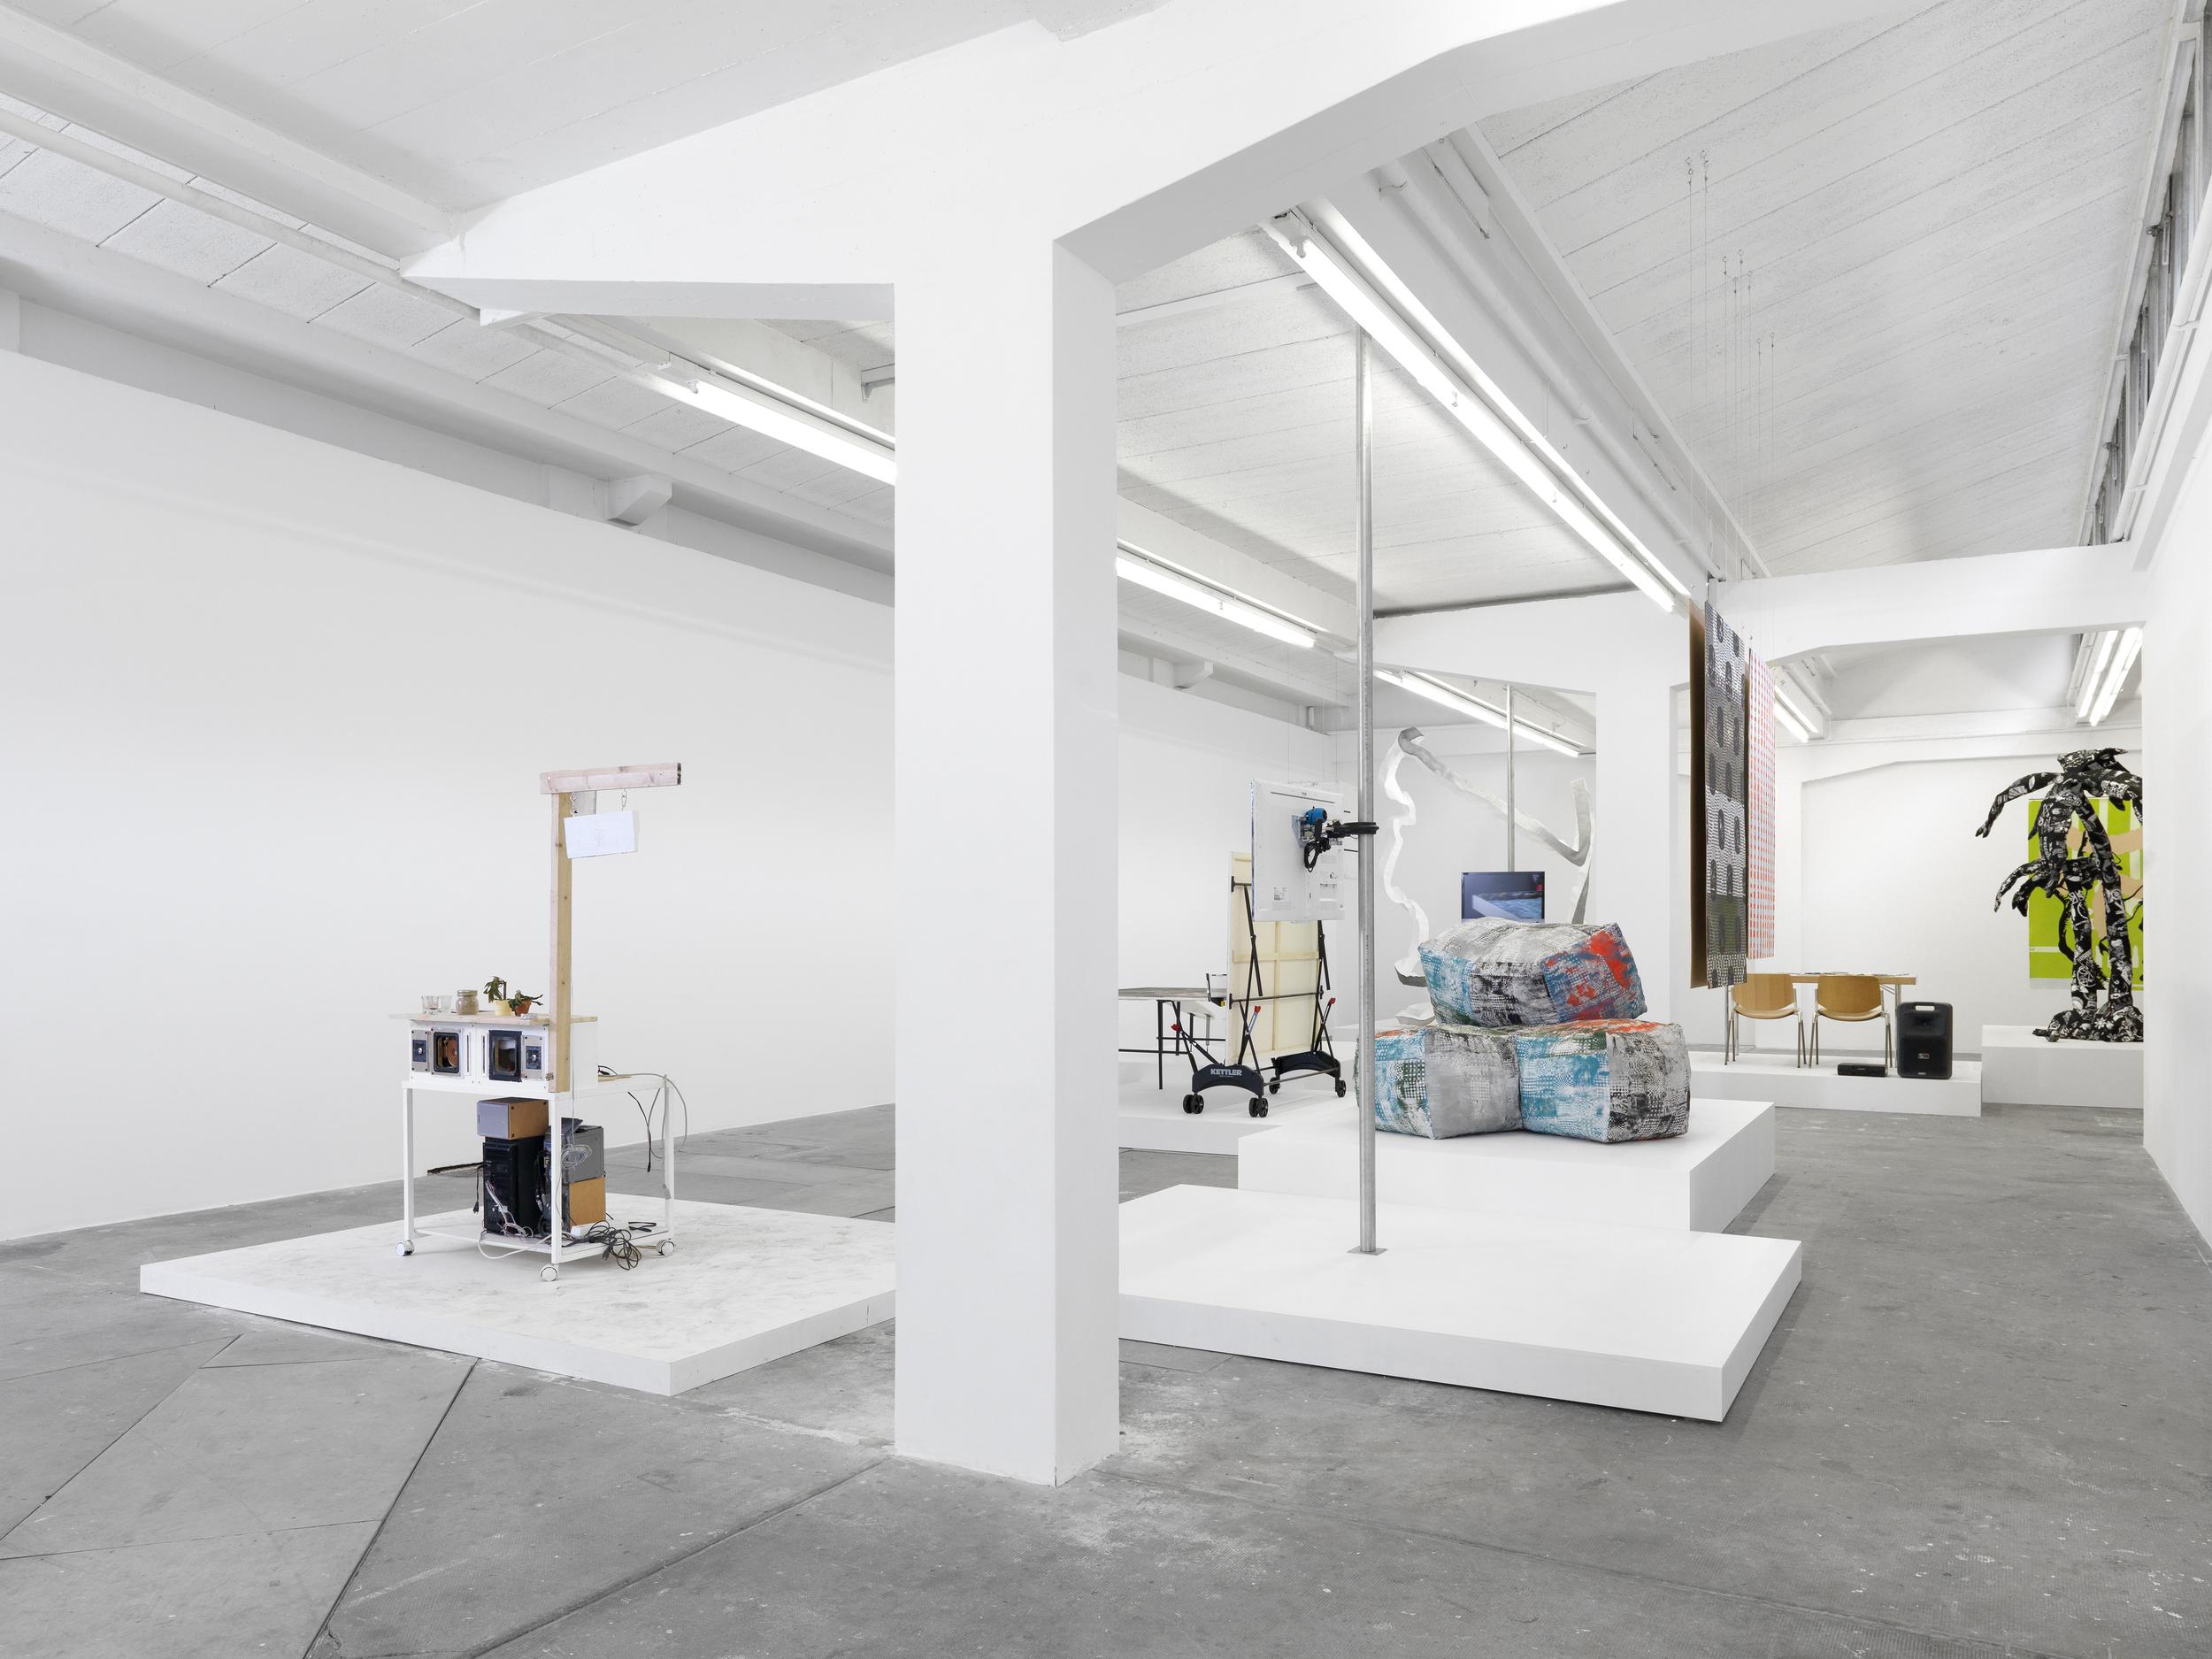 HEAD, Geneva | New Heads - Fondation BNP Paribas Art Awards | 2014